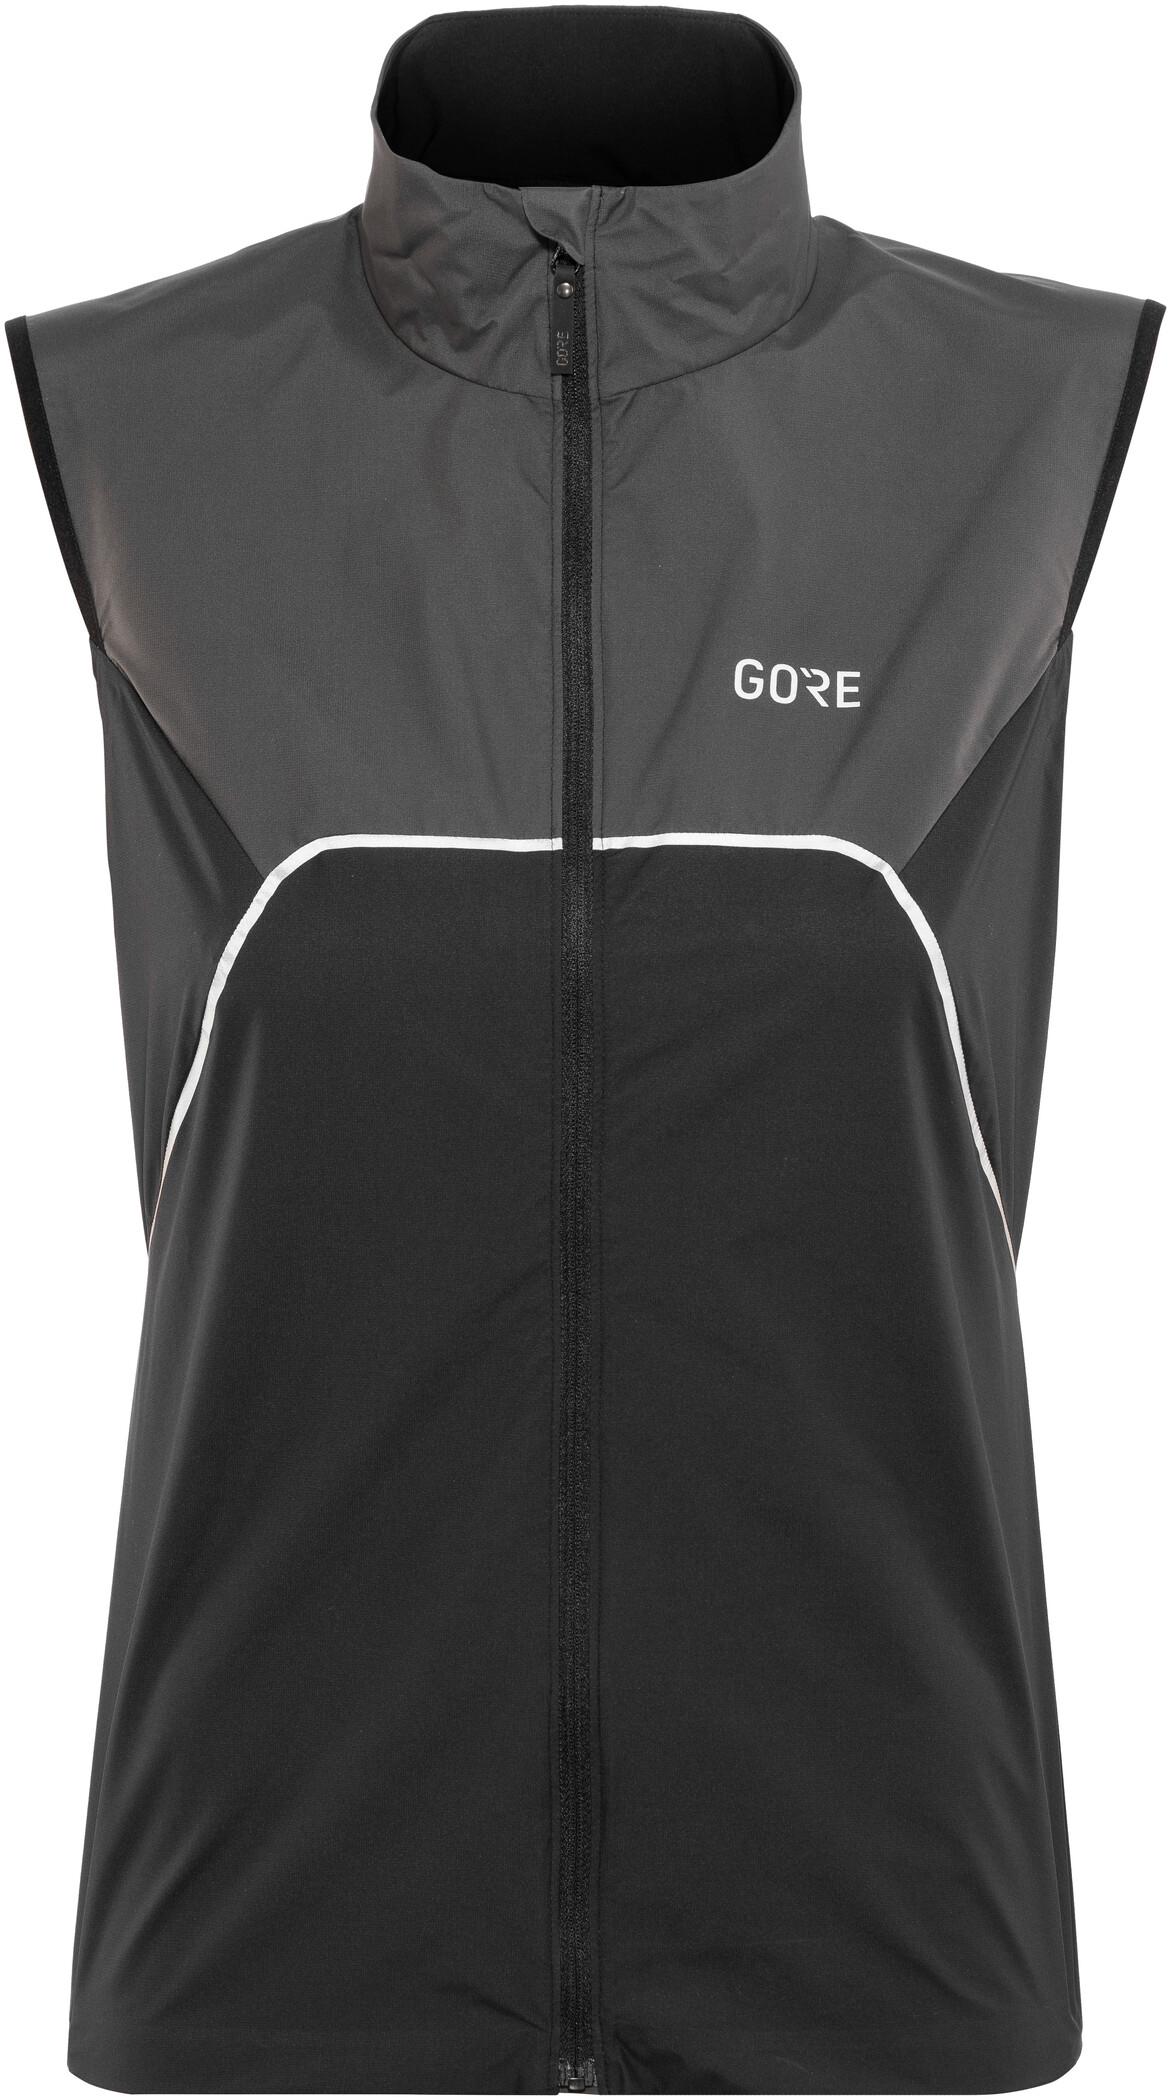 GORE WEAR R7 Partial Gore-Tex Infinium Vest Damer, black/terra grey (2019) | Vests